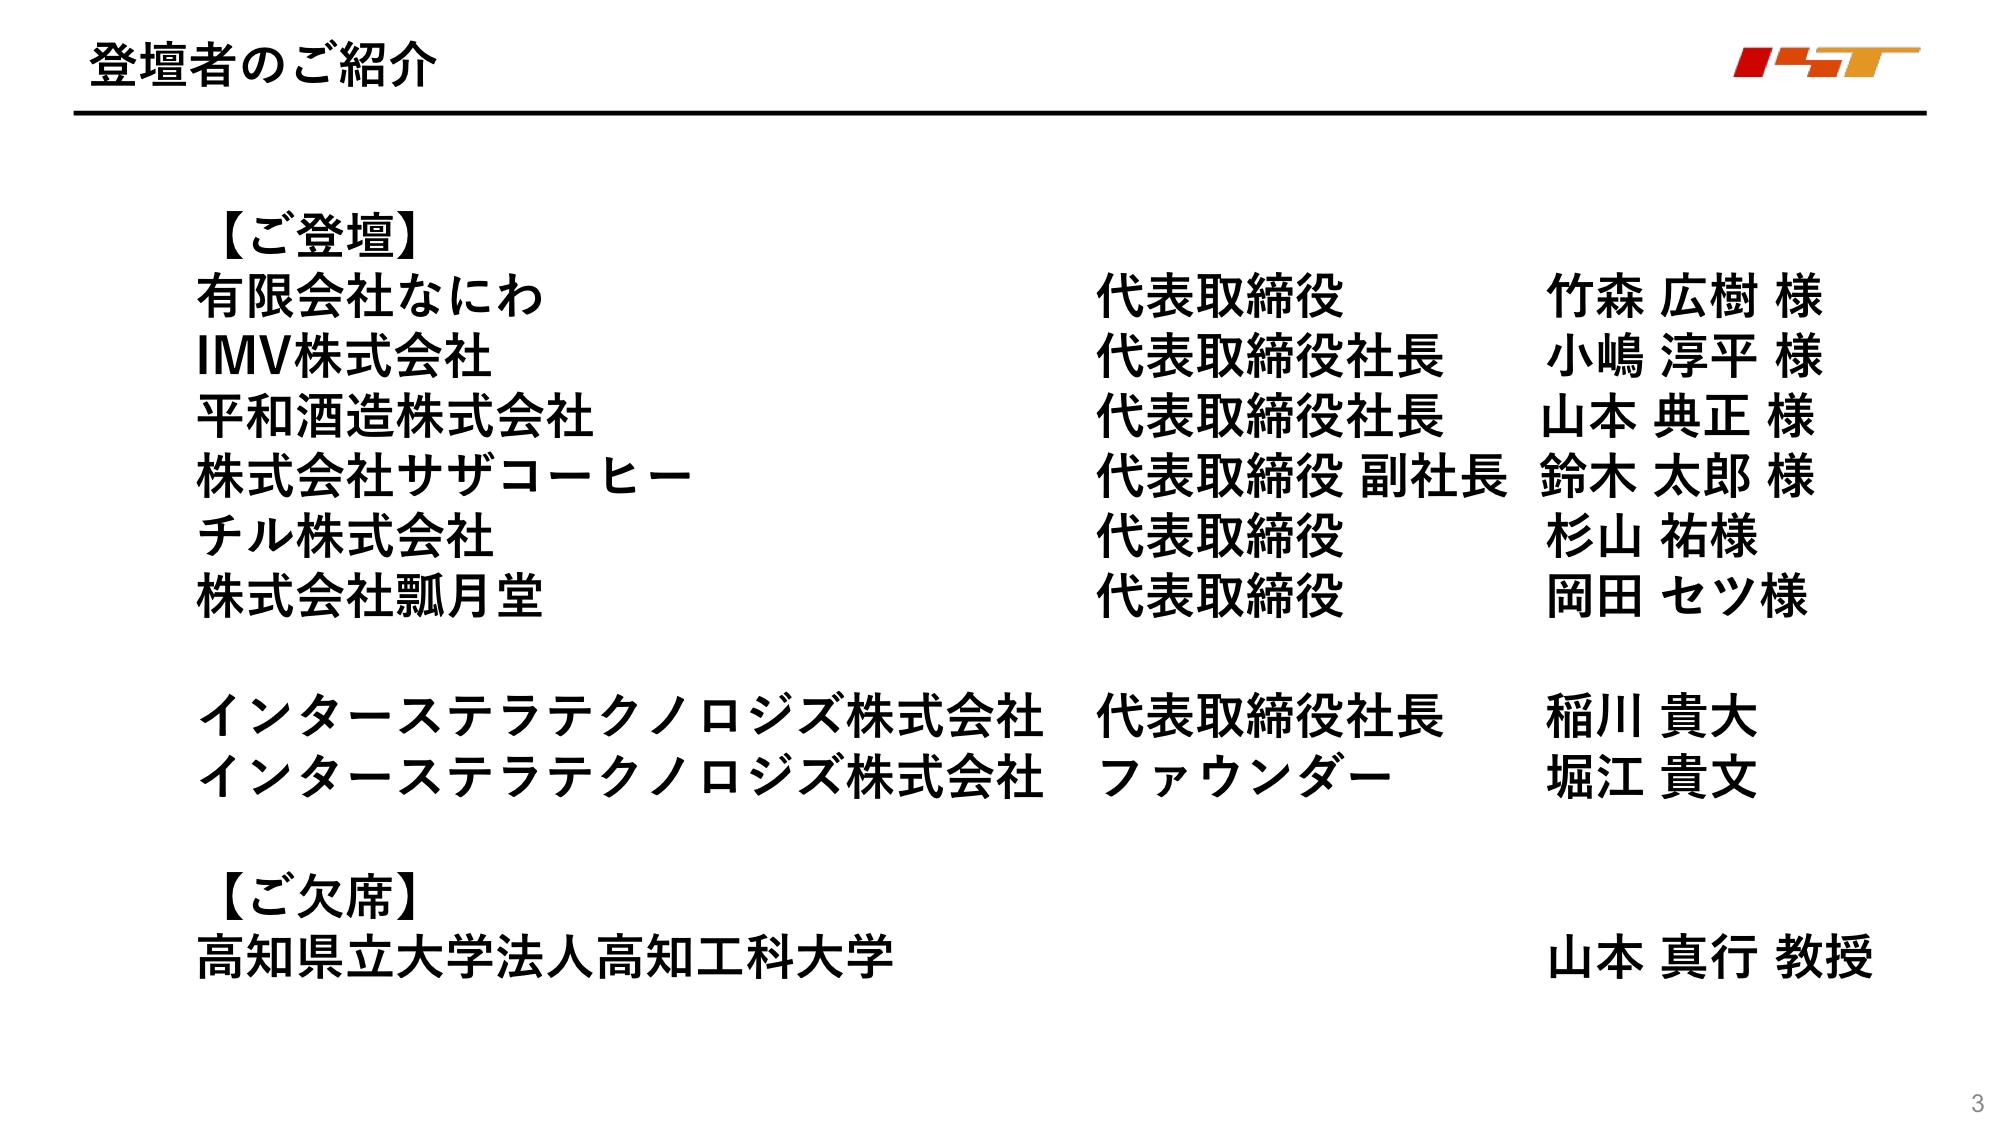 f:id:Imamura:20191126135003p:plain